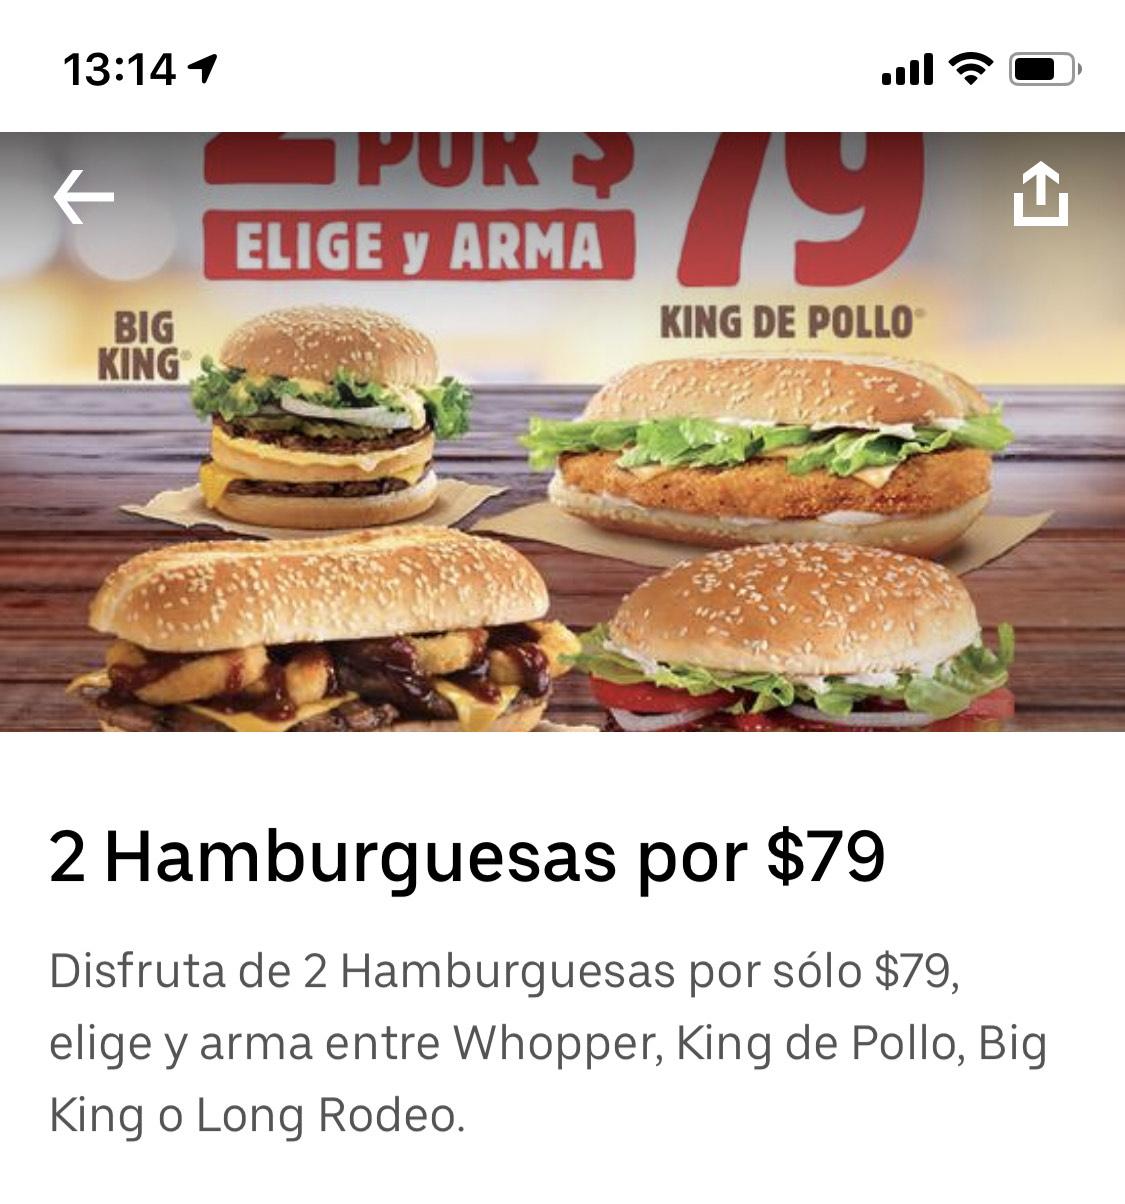 Uber Eats: 2 hamburguesas Burger King para el susto por UberEats